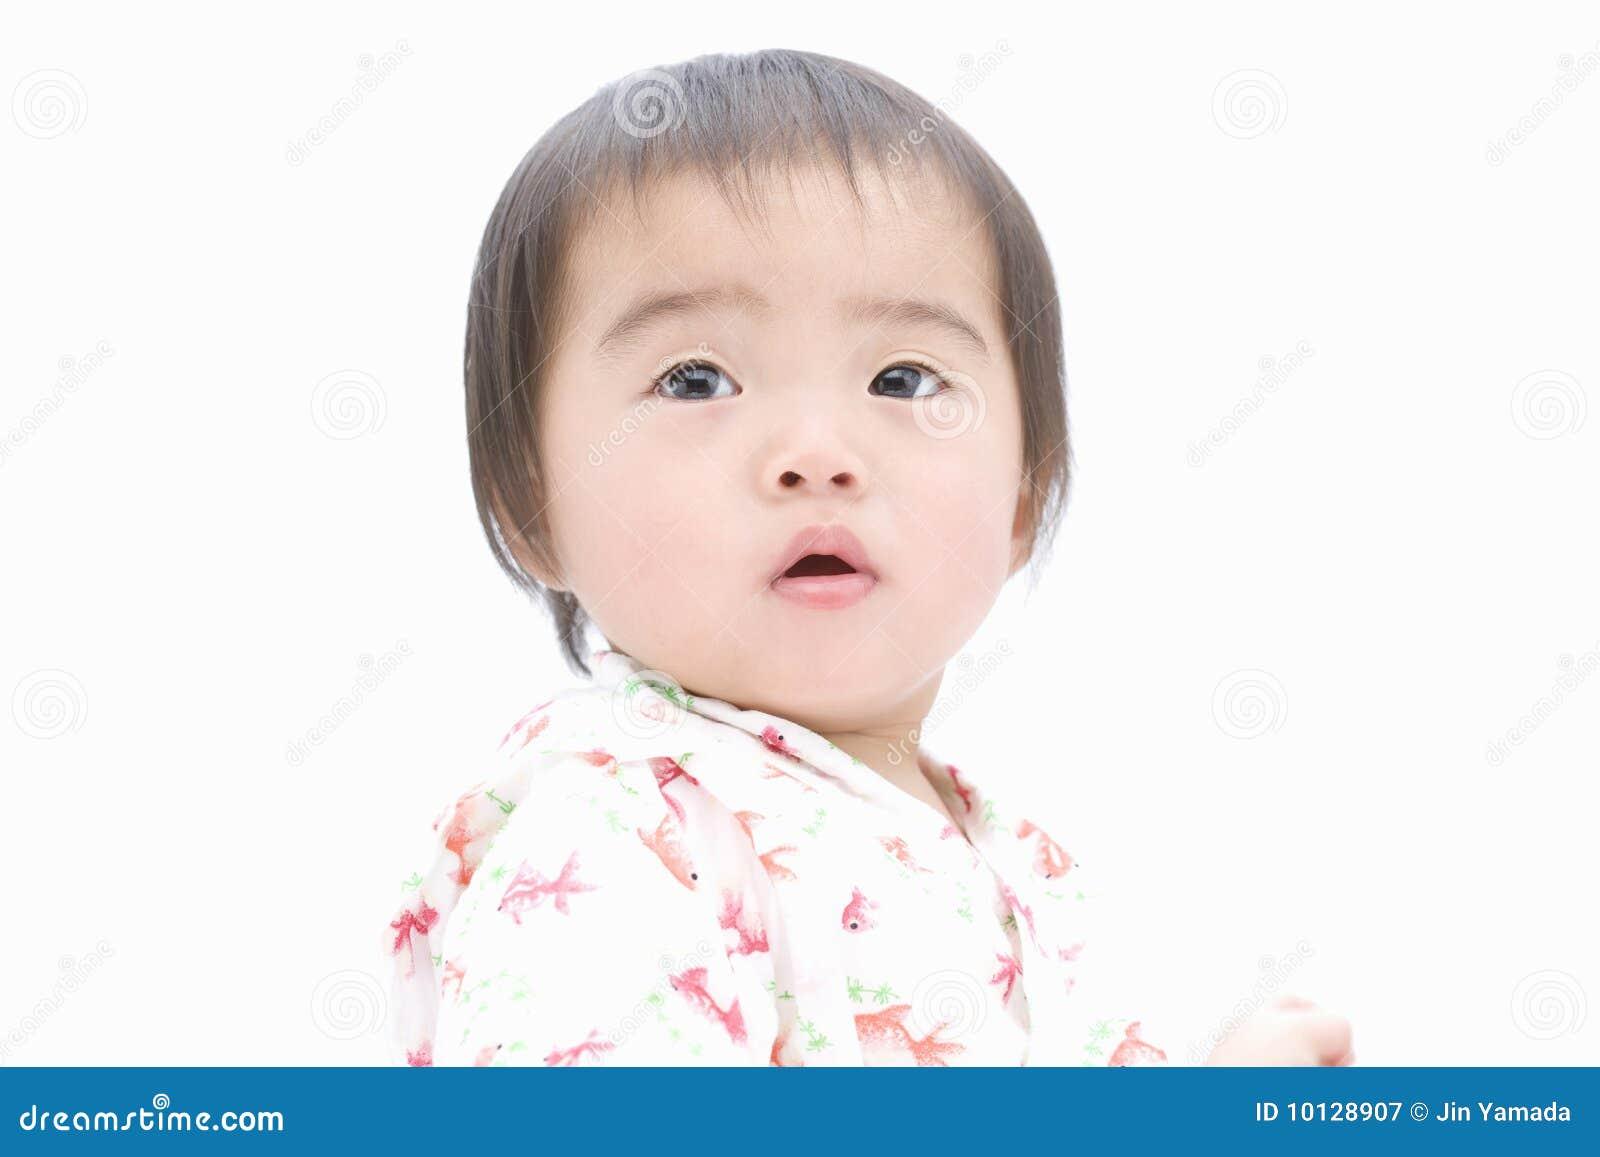 Powerful Japanese Baby